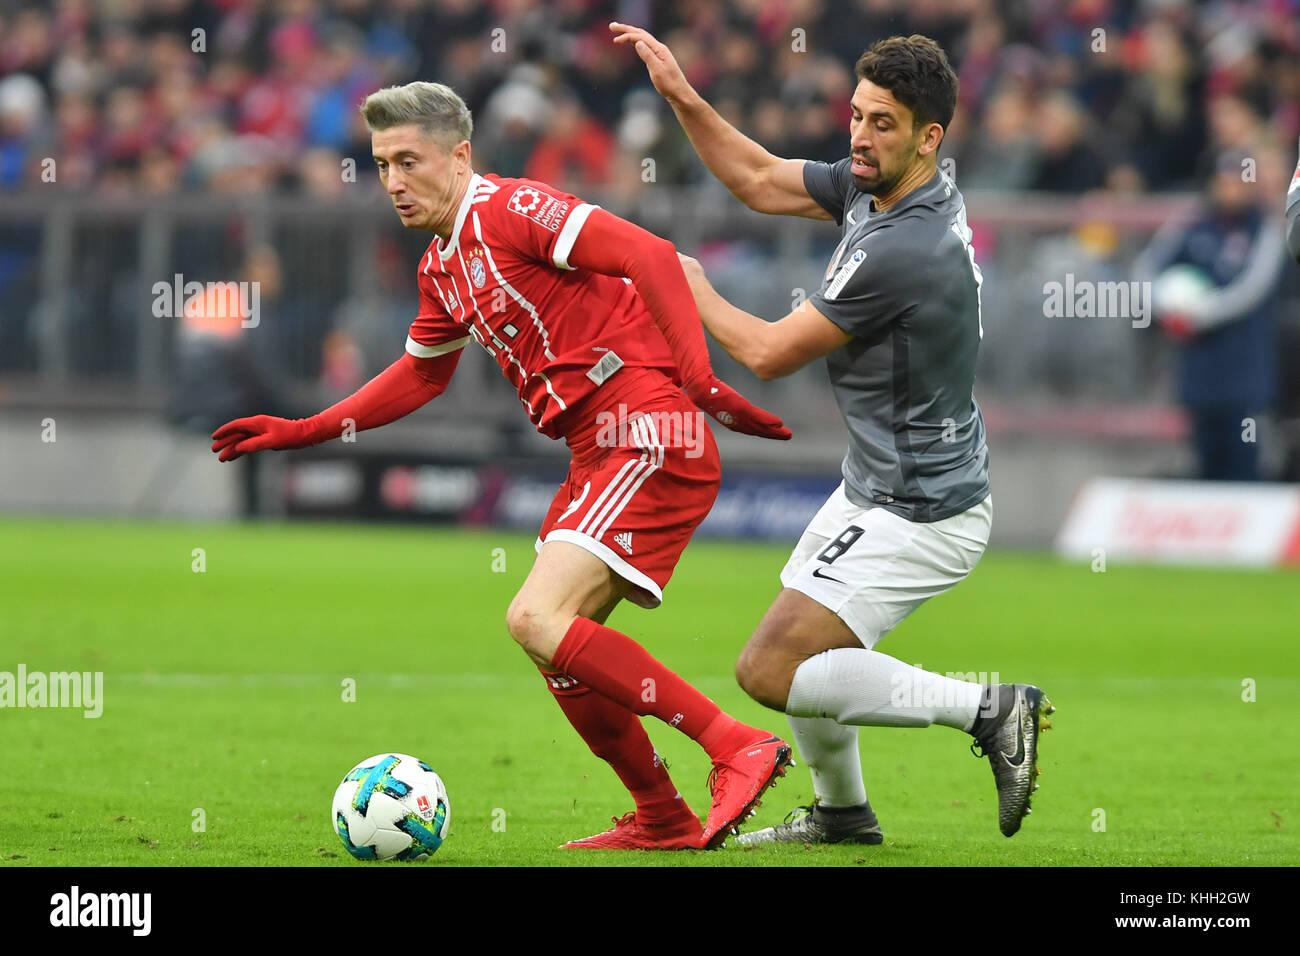 Robert LEWANDOWSKI (FC Bayern Munich), Aktion, duels versus Rani KHEDIRA (FC Augsburg), Fussball 1. Bundesliga, - Stock Image